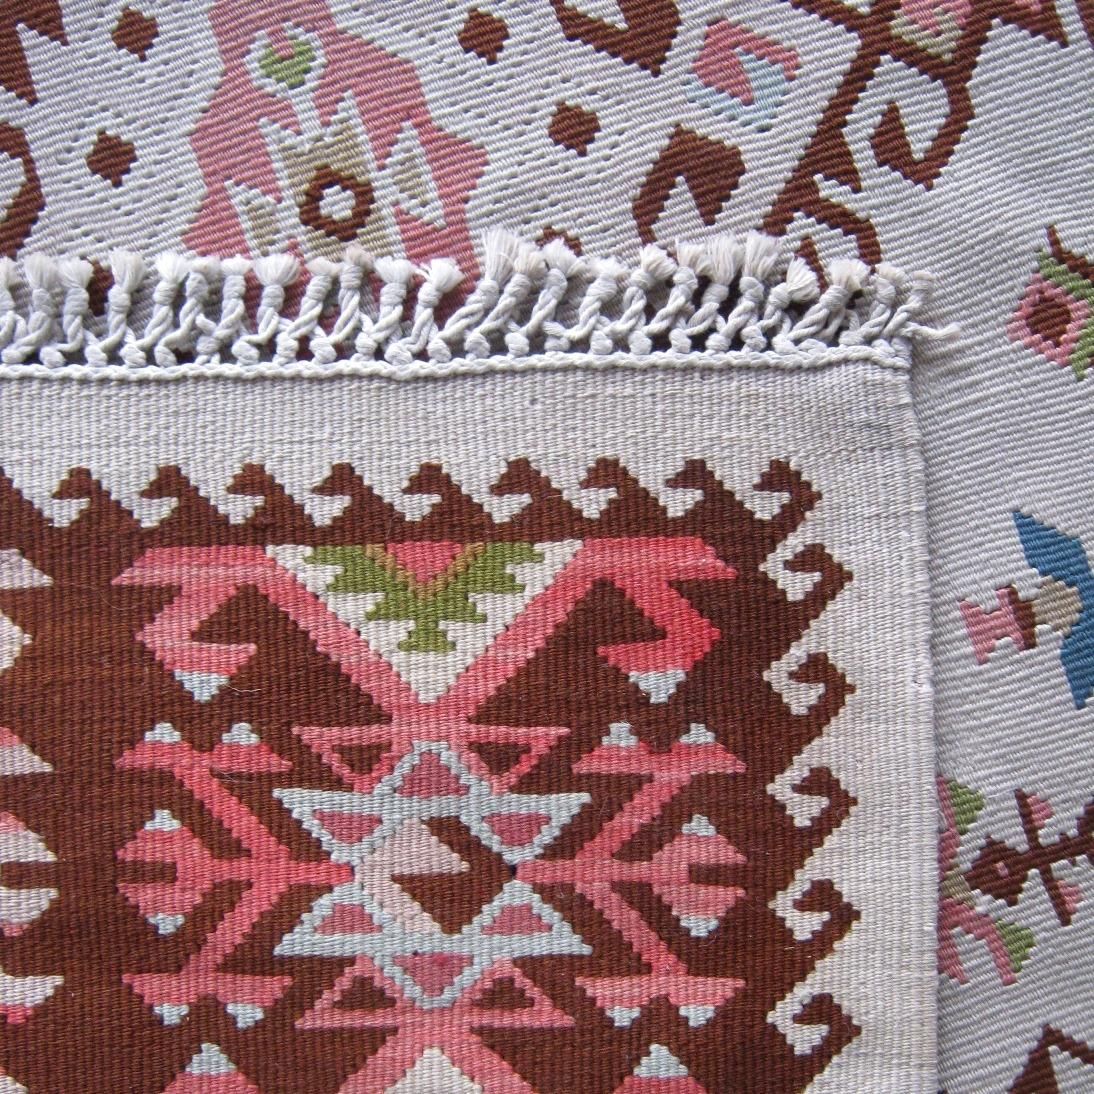 Tappeto Tisca kilim, vendita online tappeti Classici - Tappeti a prezzi scontati